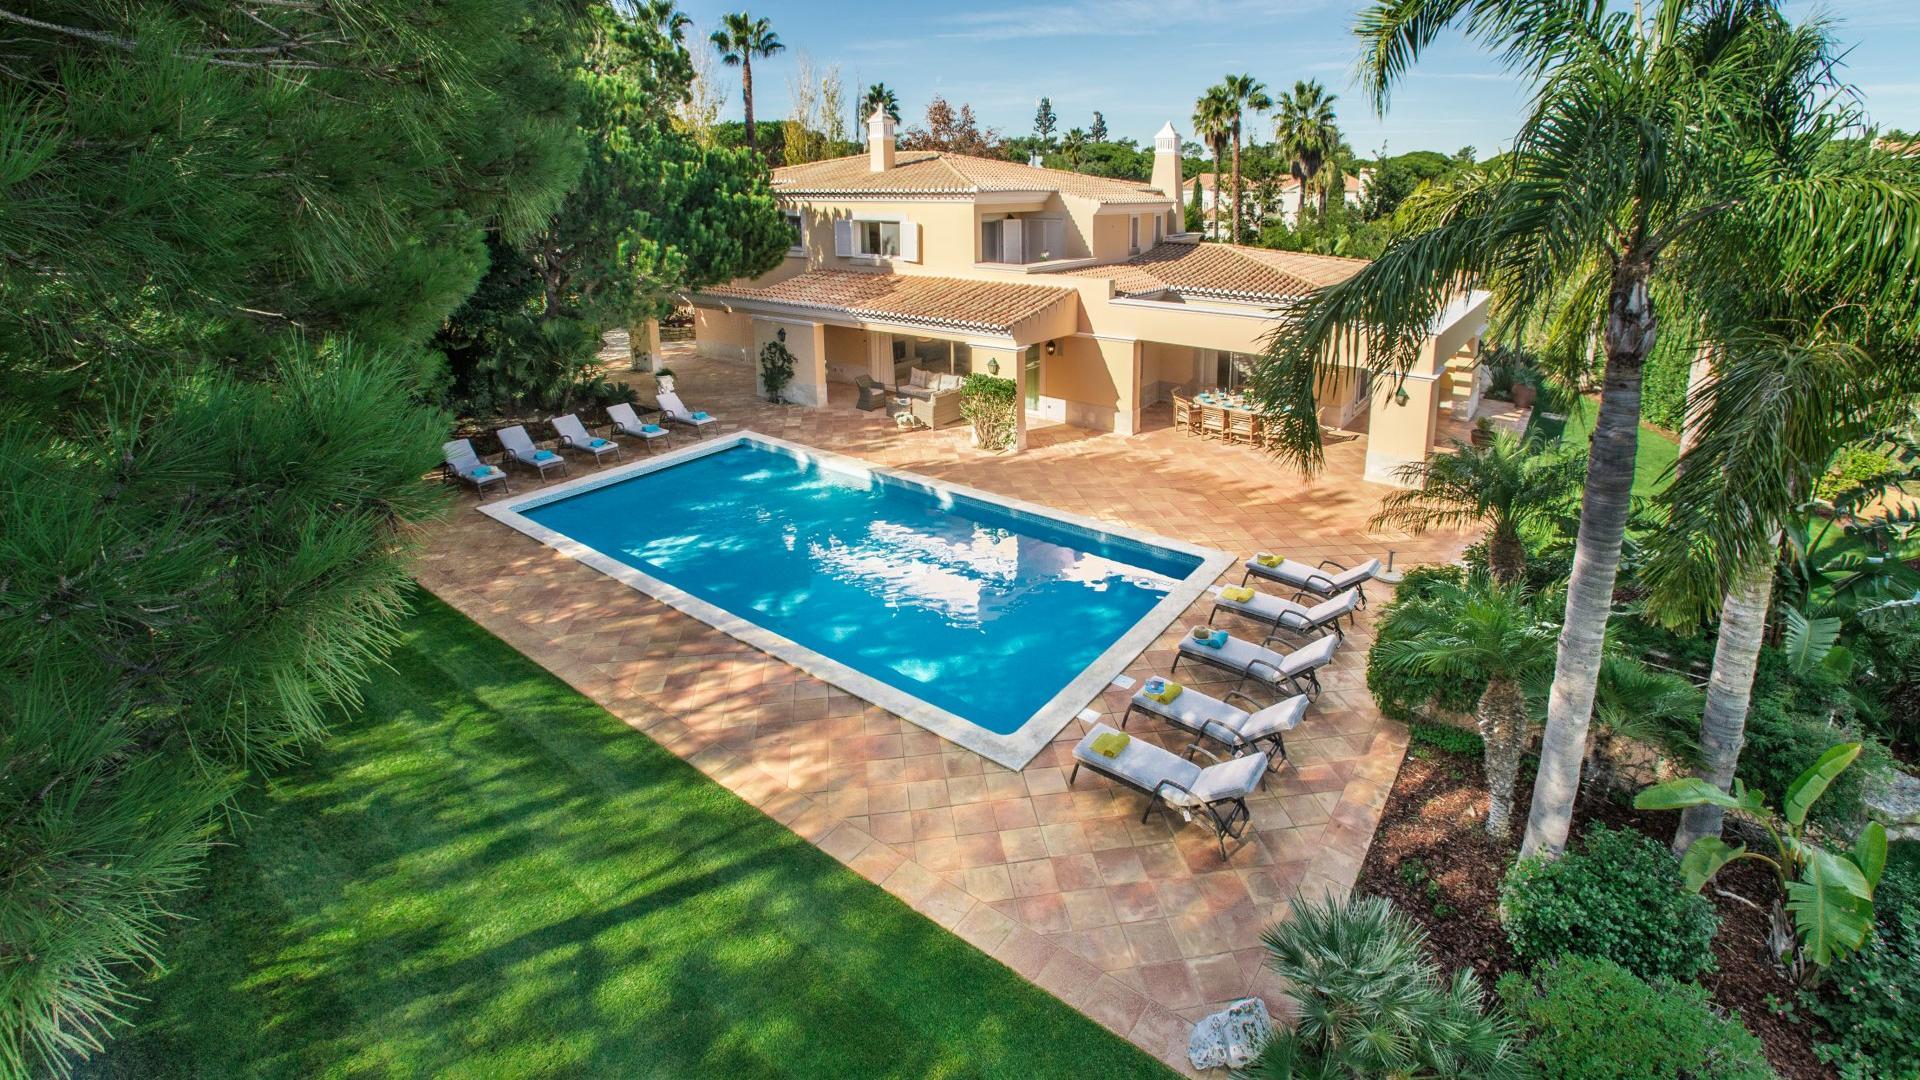 Villa Mabel  - Quinta do Lago, Algarve - Atlantico_40_5.jpg